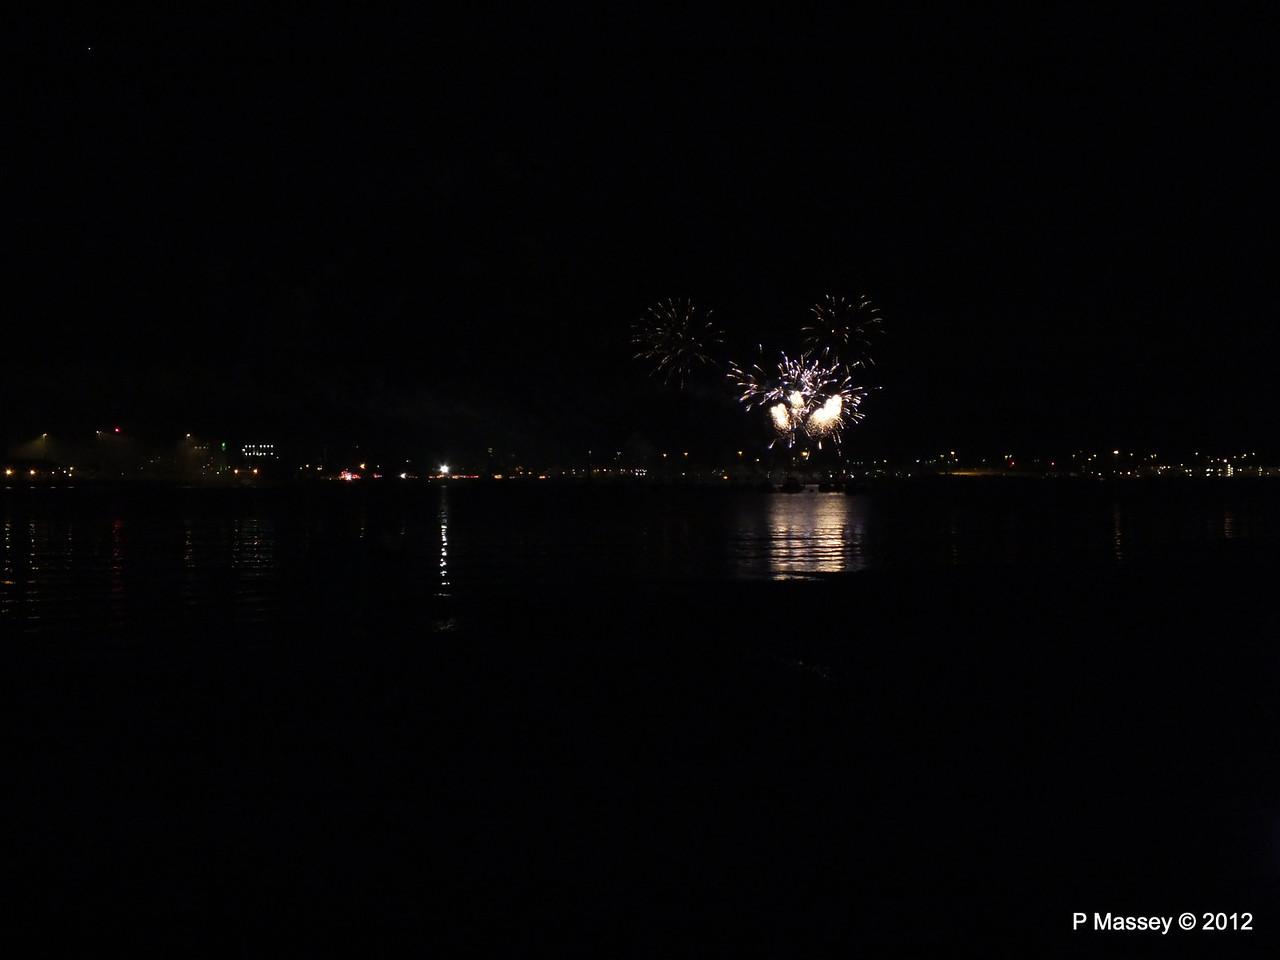 Fireworks off Mayflower Park PDM 03-11-2012 20-52-40